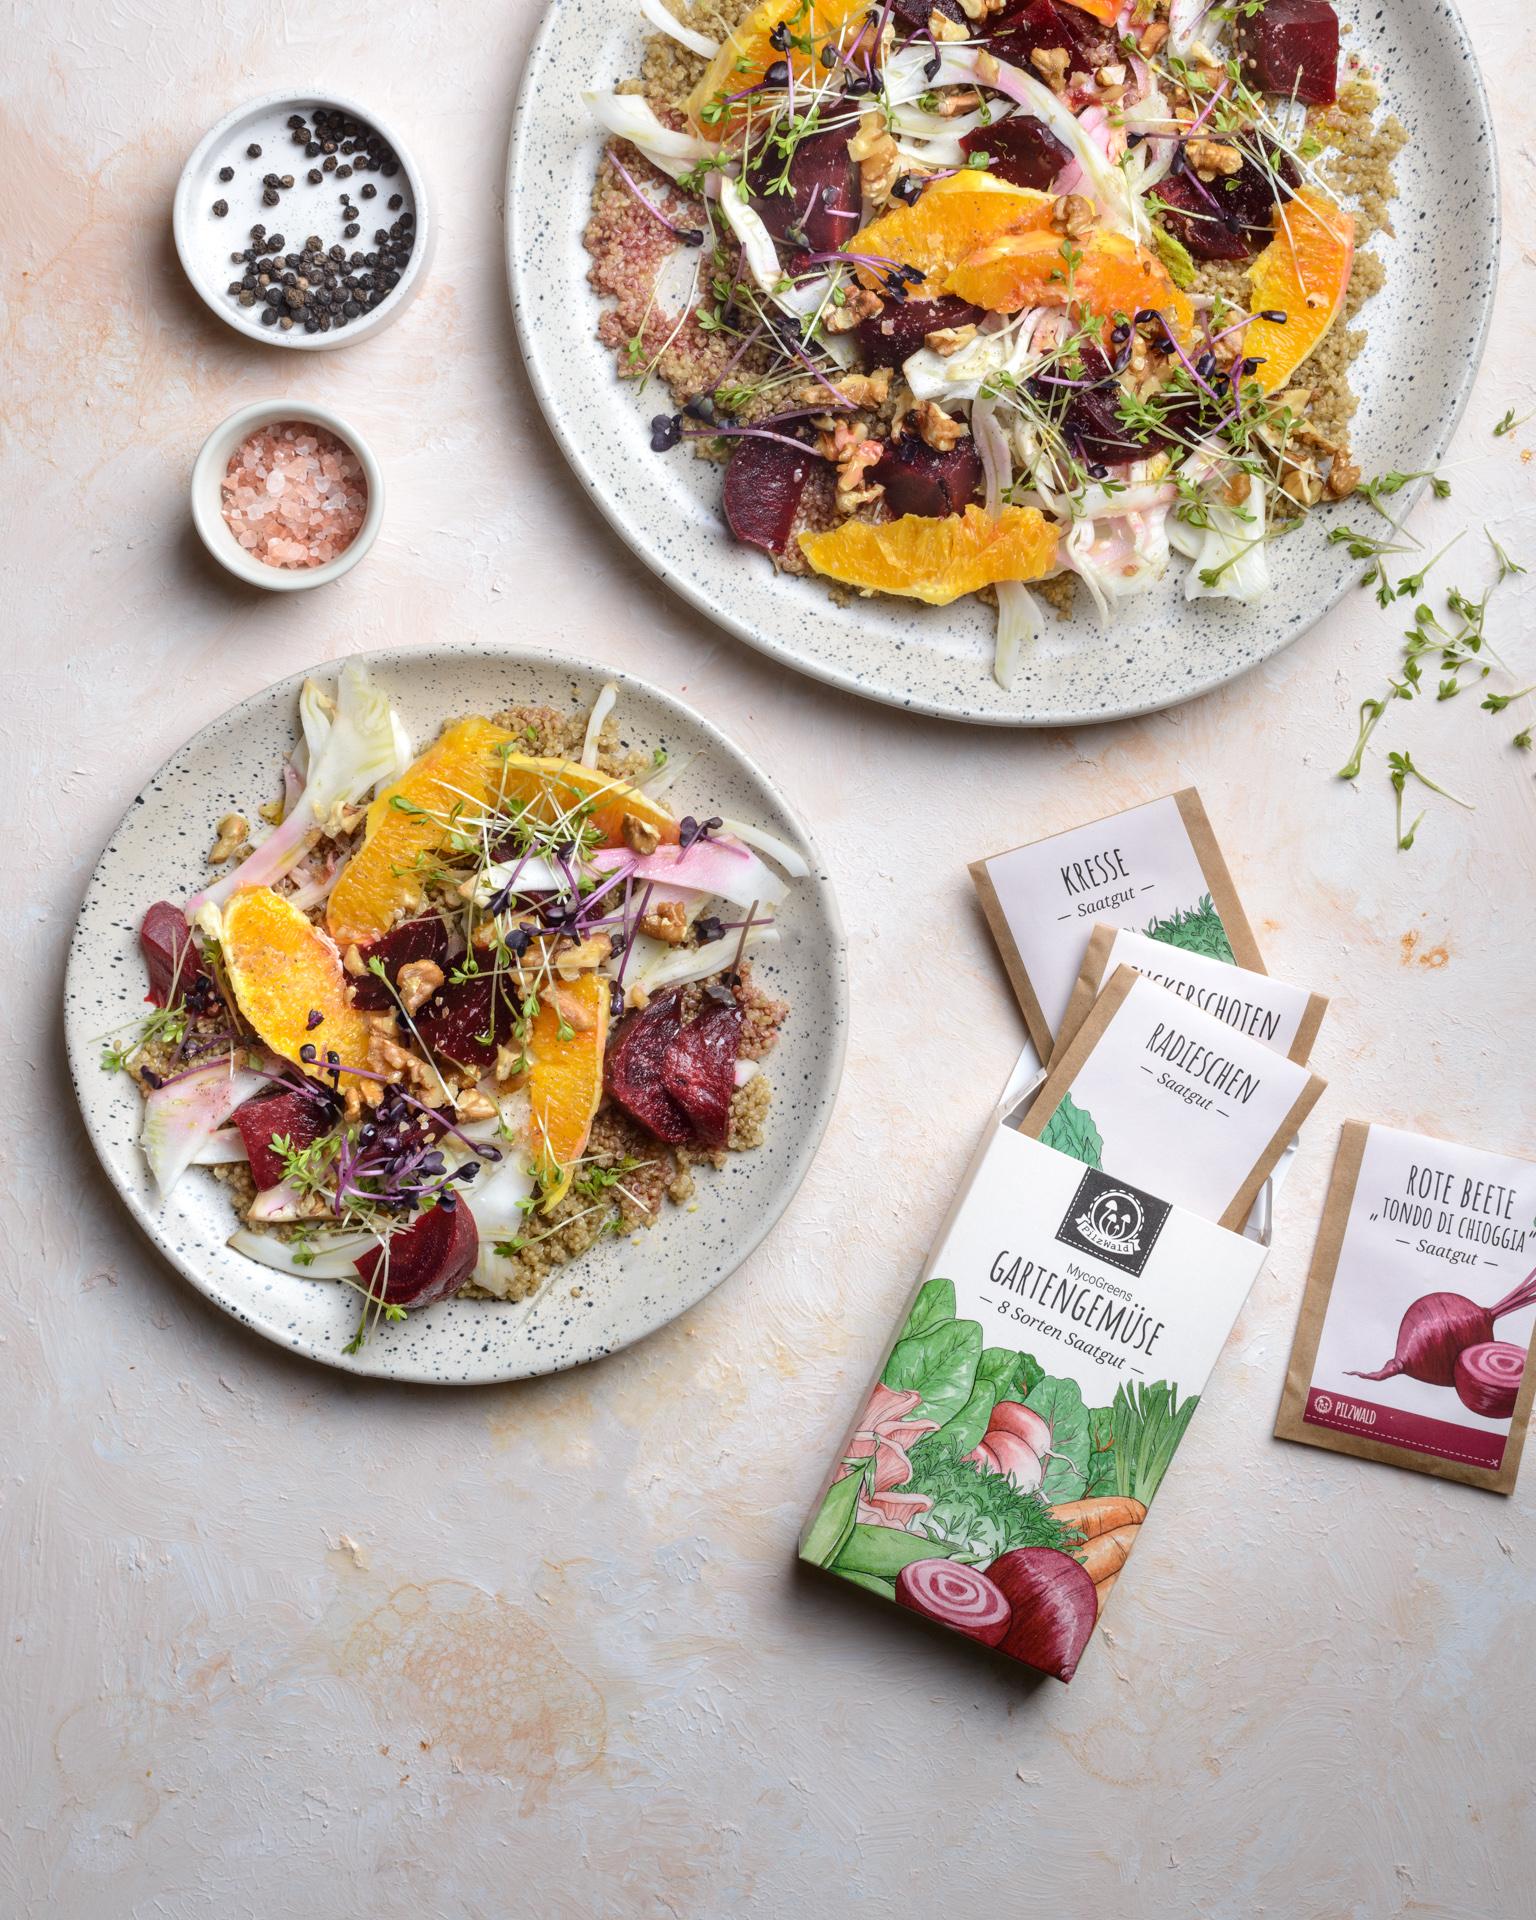 Kräuter und Gemüse Saatgut auf Teller